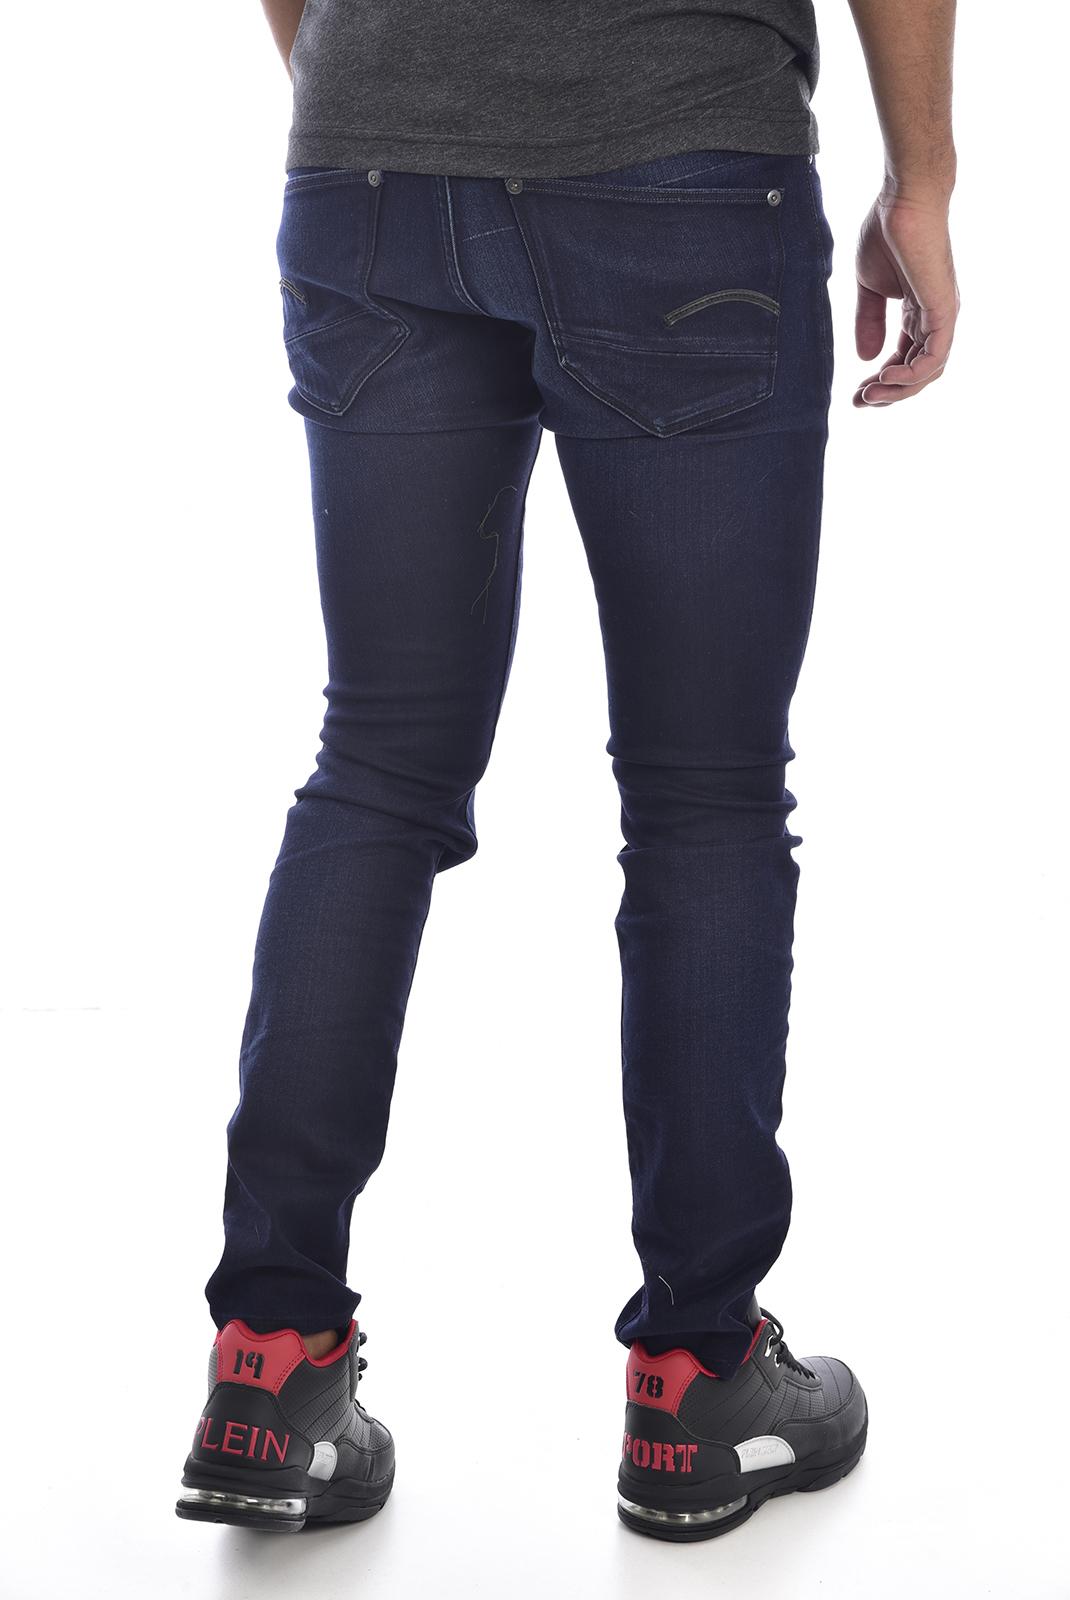 Jeans  G-star 51010-6590-89 revend bleu